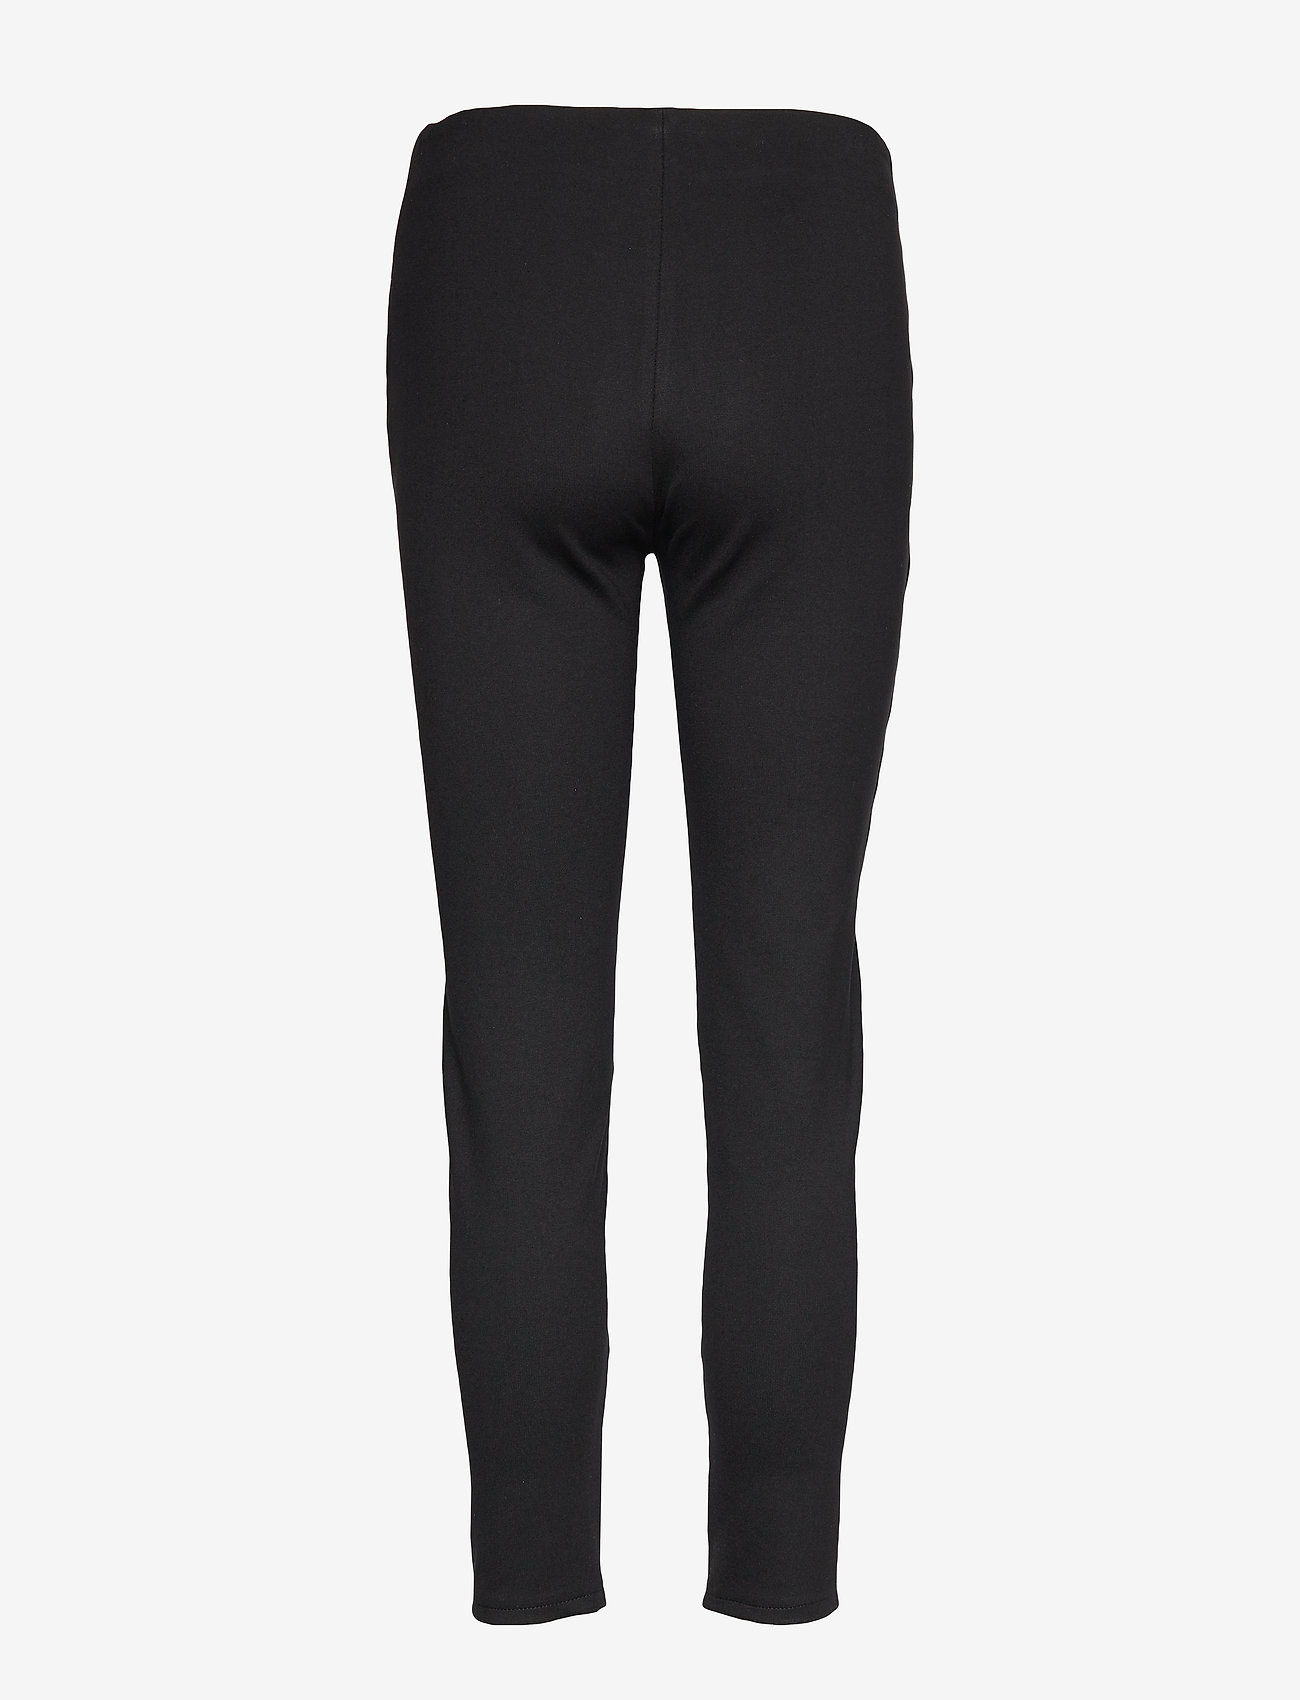 Calvin Klein - ESSENTIAL LEATHER MIX LEGGING - lederhosen - calvin black - 1